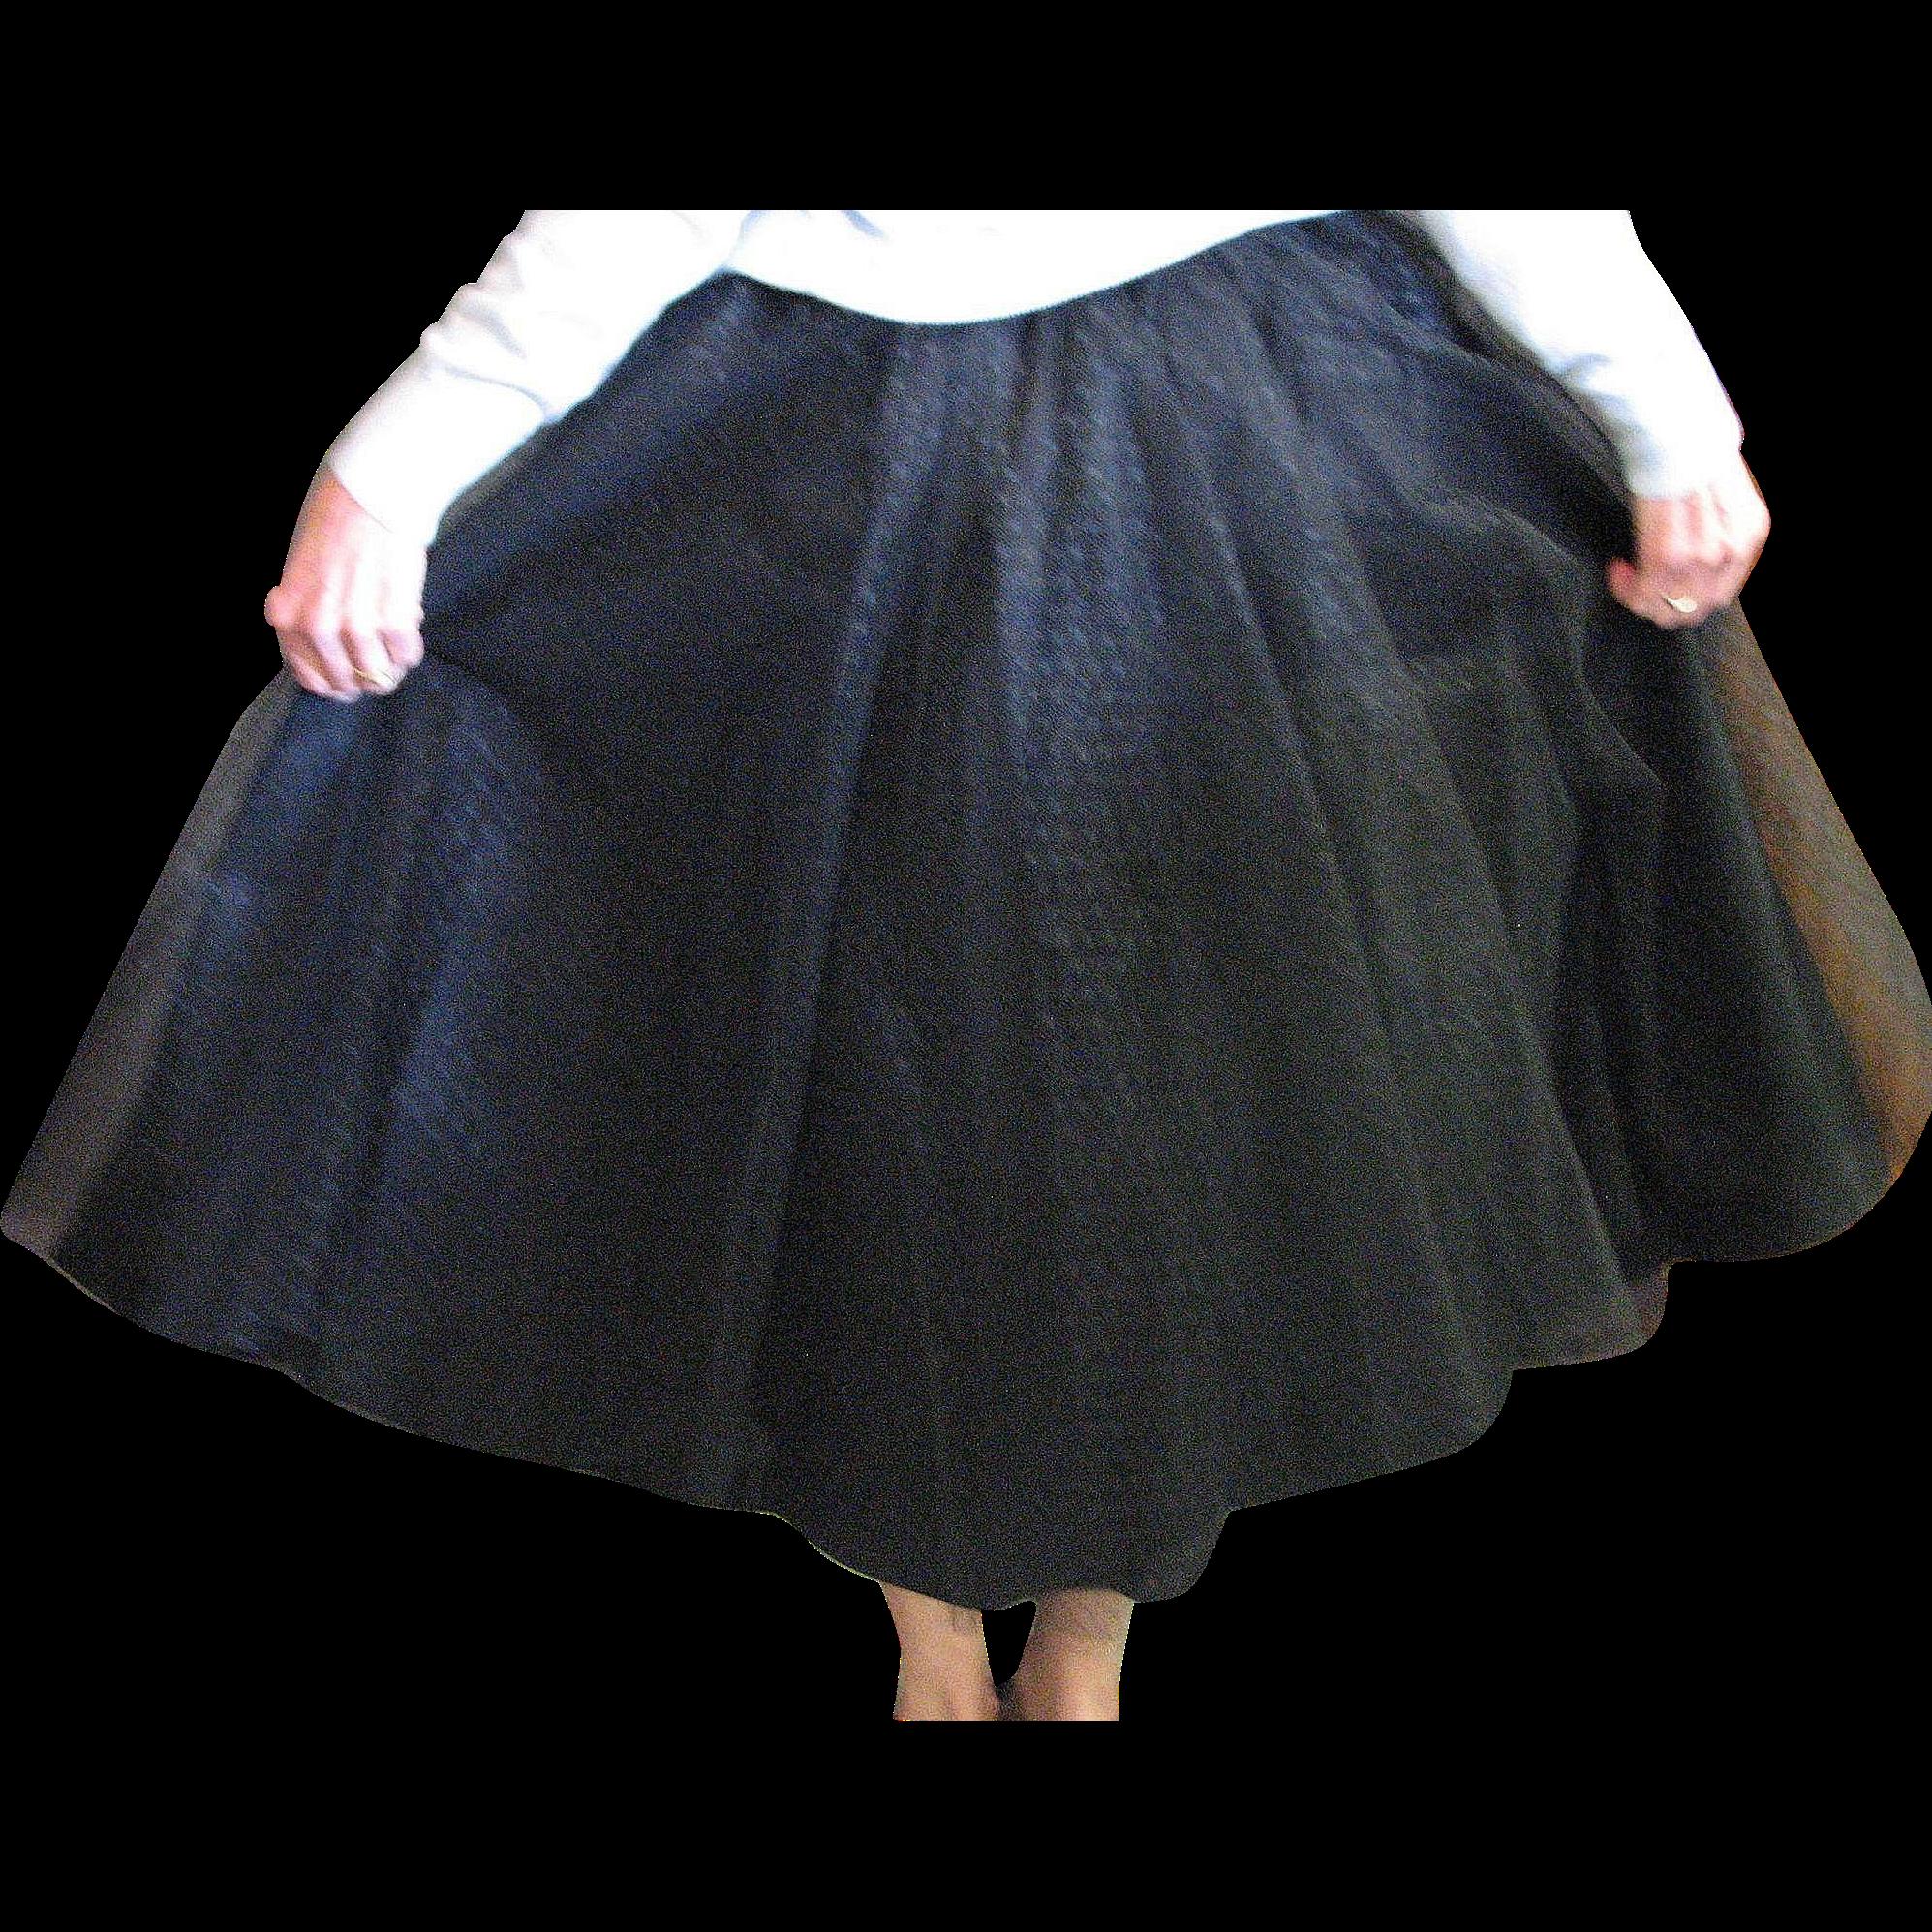 Vintage Stunning Black Taffeta & Net Circle Skirt from ...